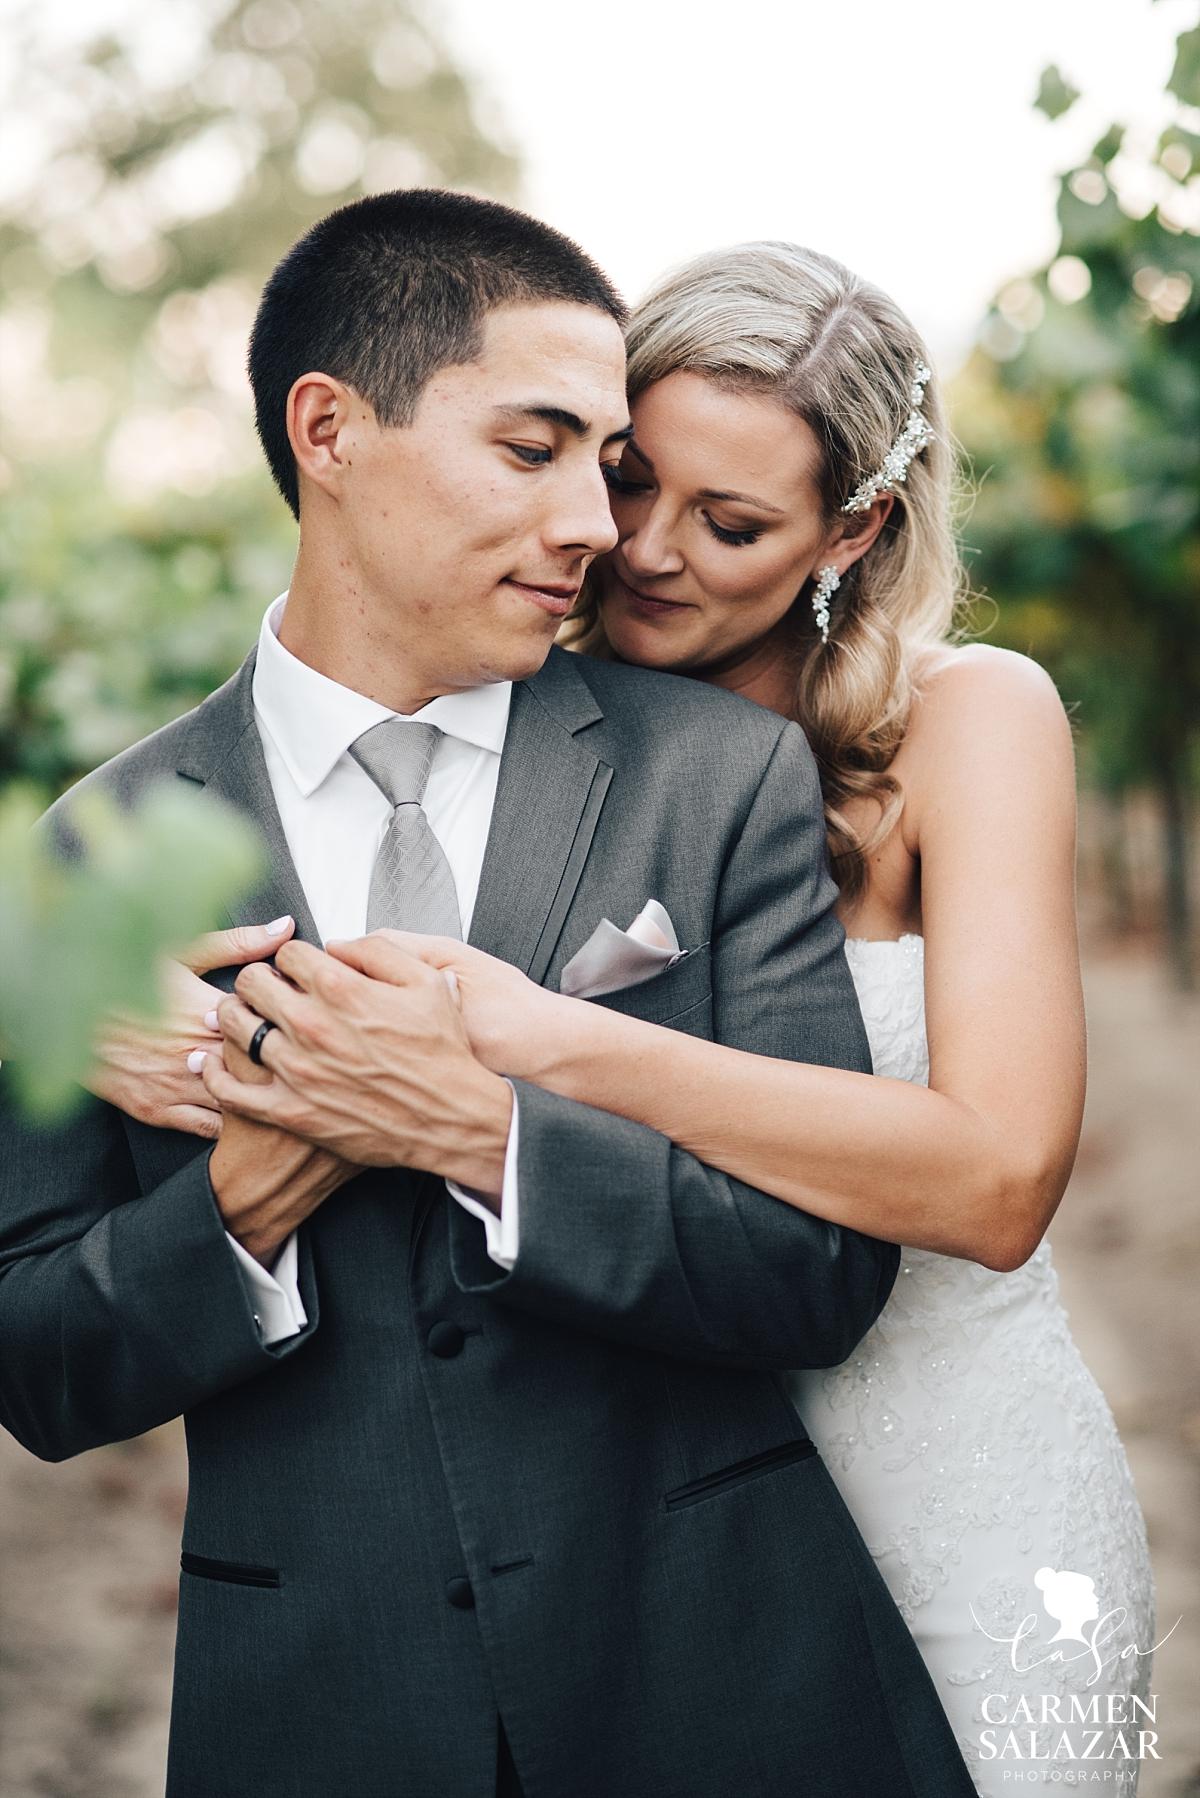 Romantic Sacramento vineyard wedding portraits - Carmen Salazar